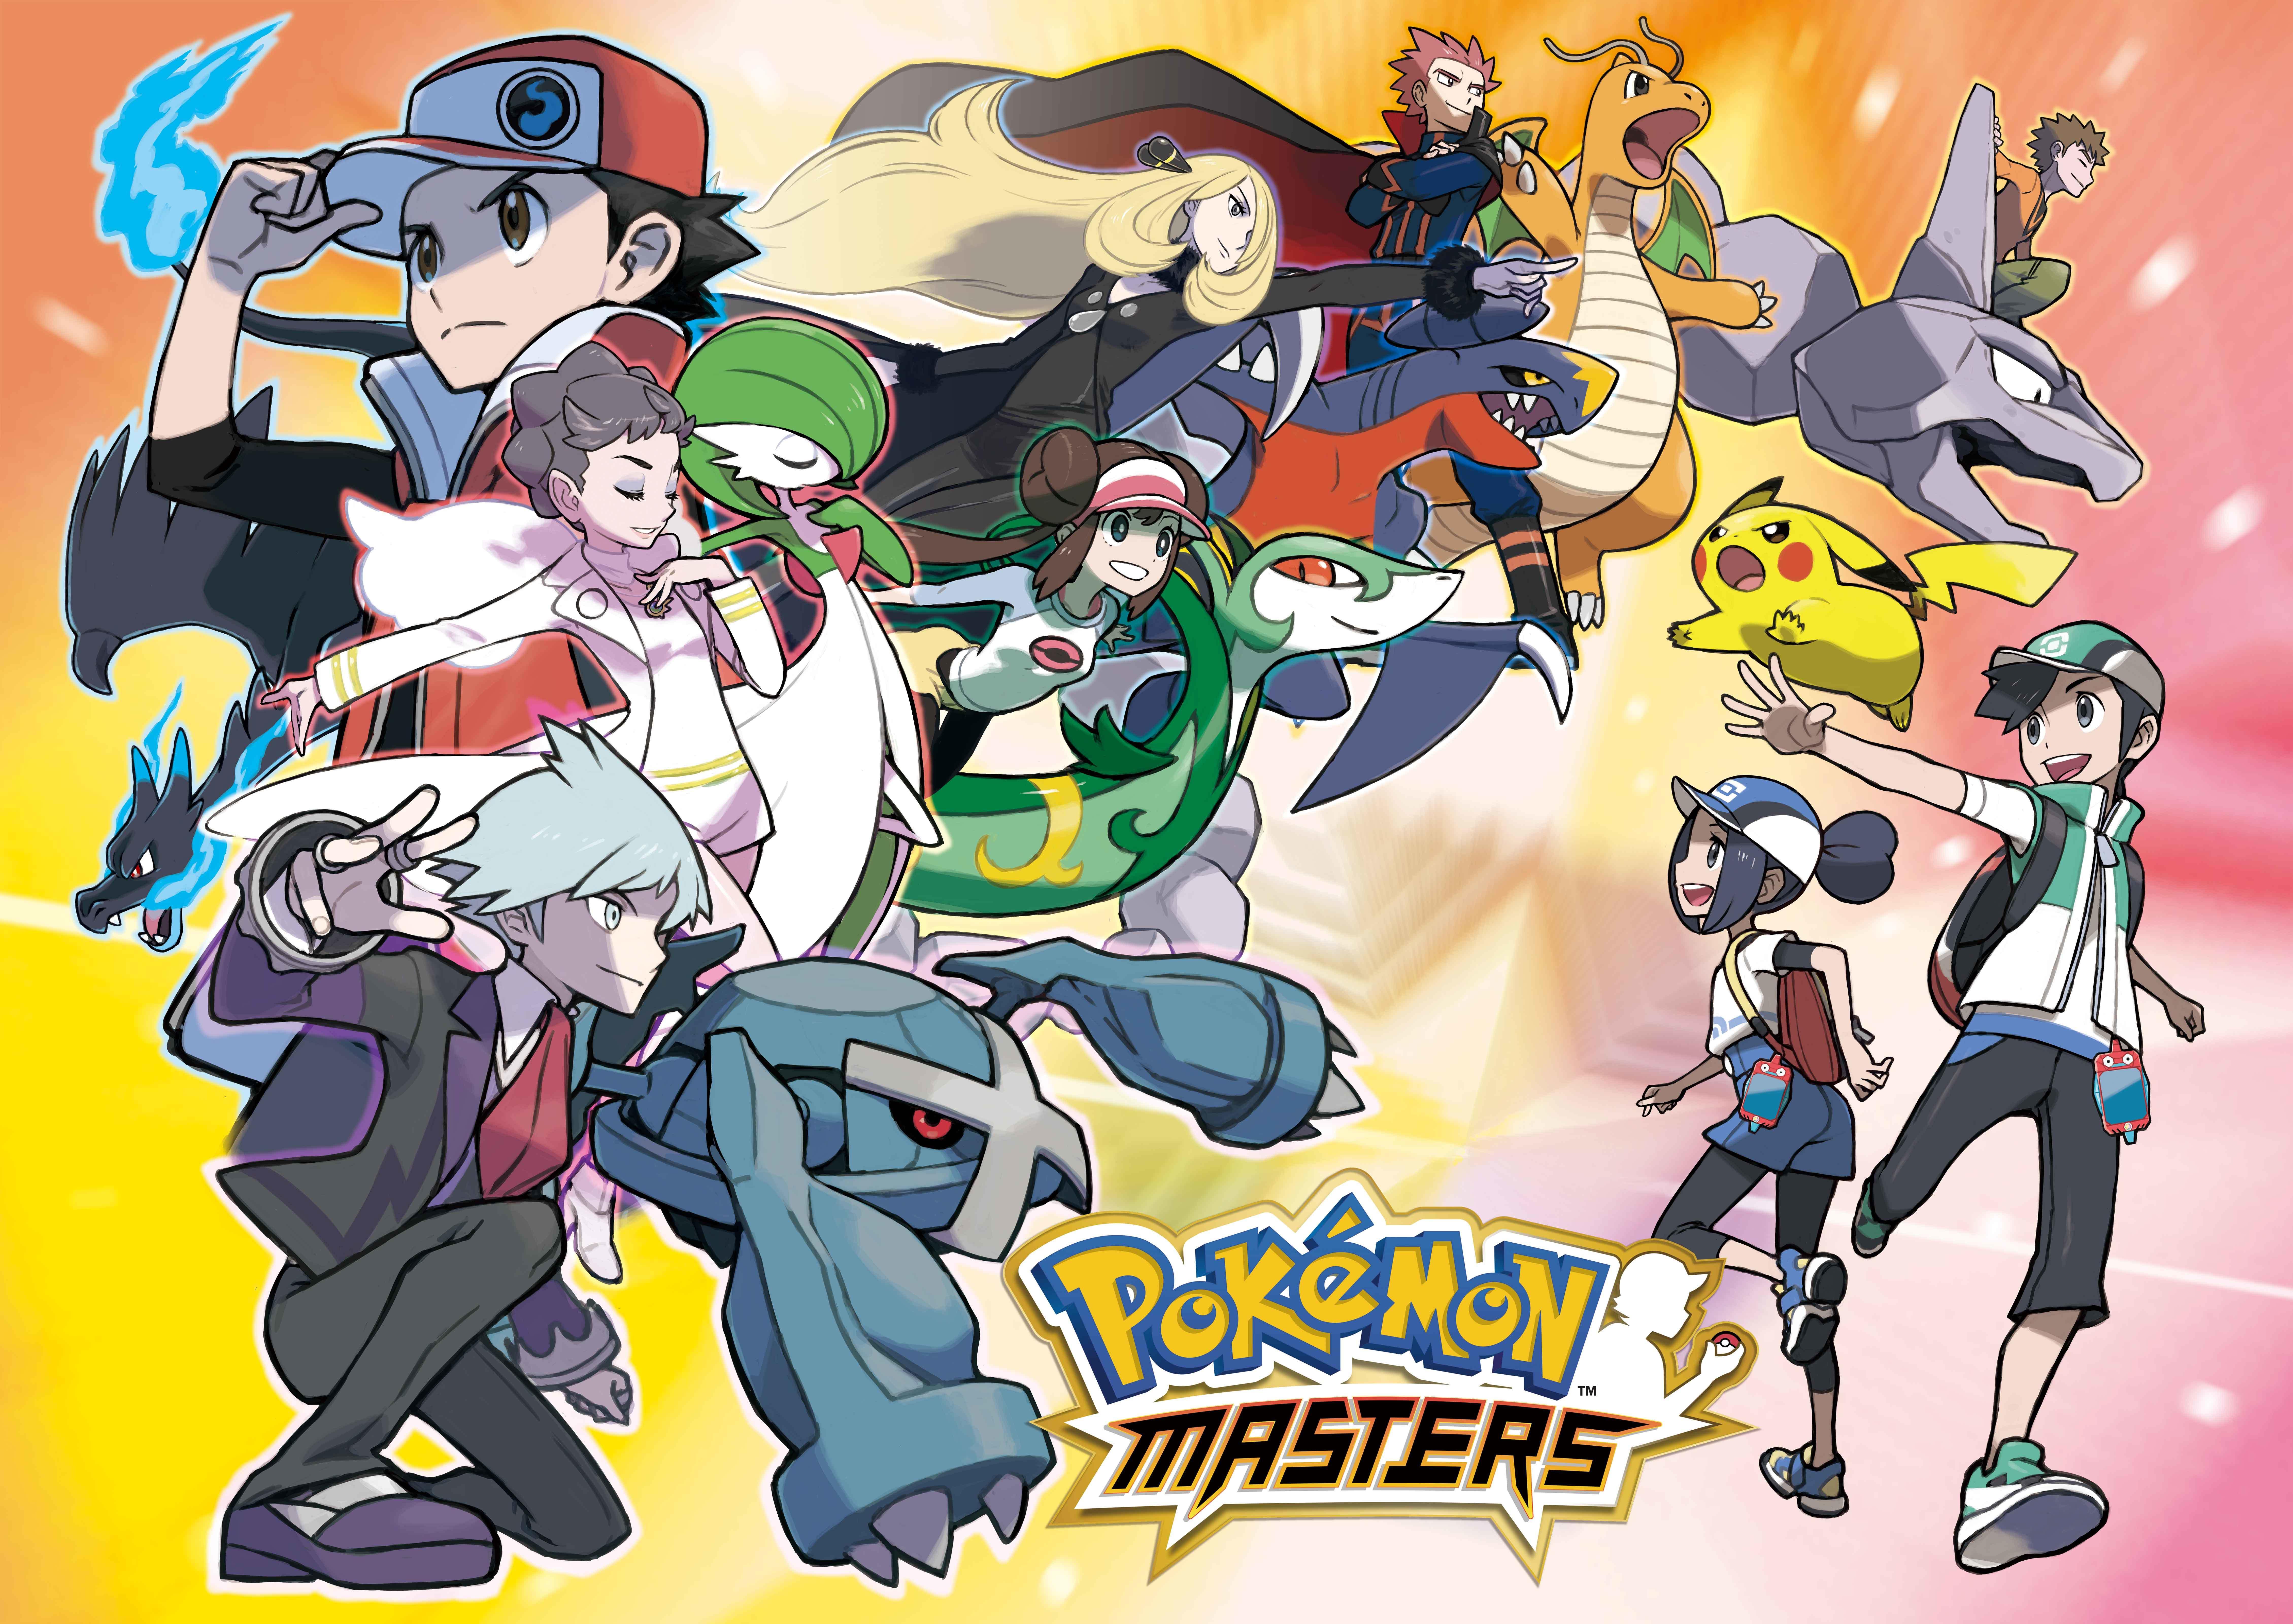 『PokemonMasters』ロゴ (C)2019 DeNA Co., Ltd. (C)2019 Pokemon. (C)1995-2019 Nintendo / Creatures Inc. / GAME FREAK inc.